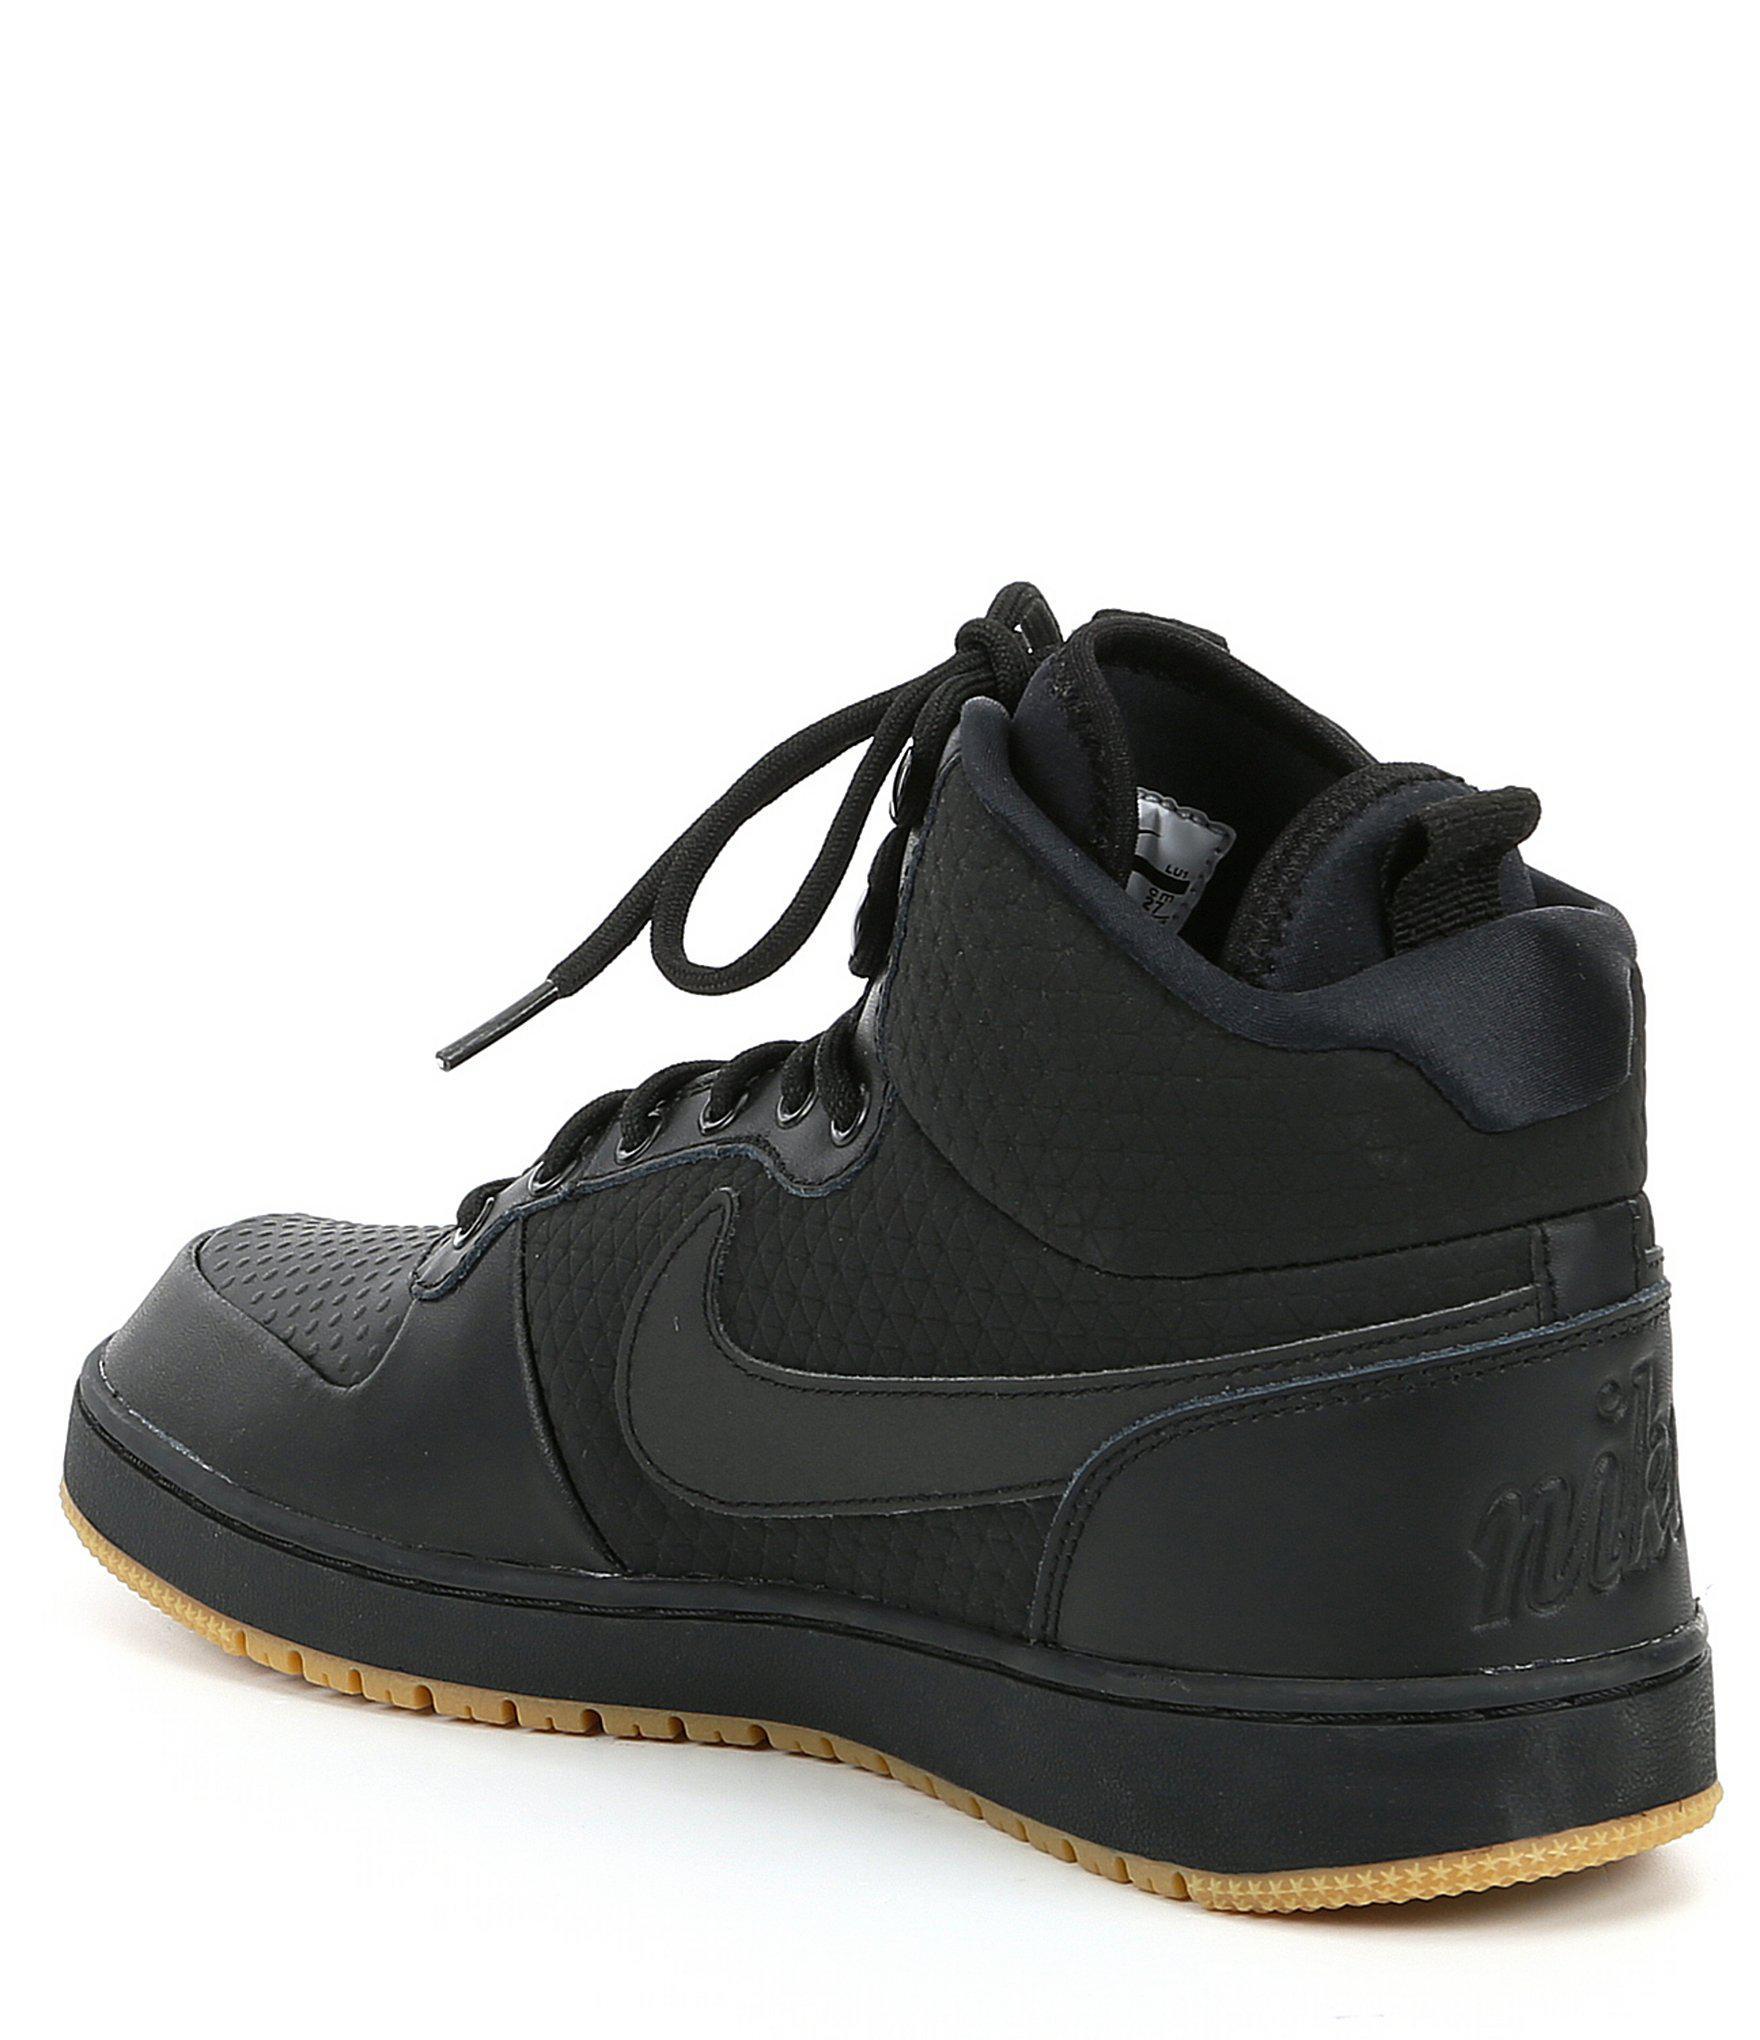 Lyst - Nike Men s Ebernon Mid Winter Lifestyle Sneaker in Black for Men f5eeaa0de4